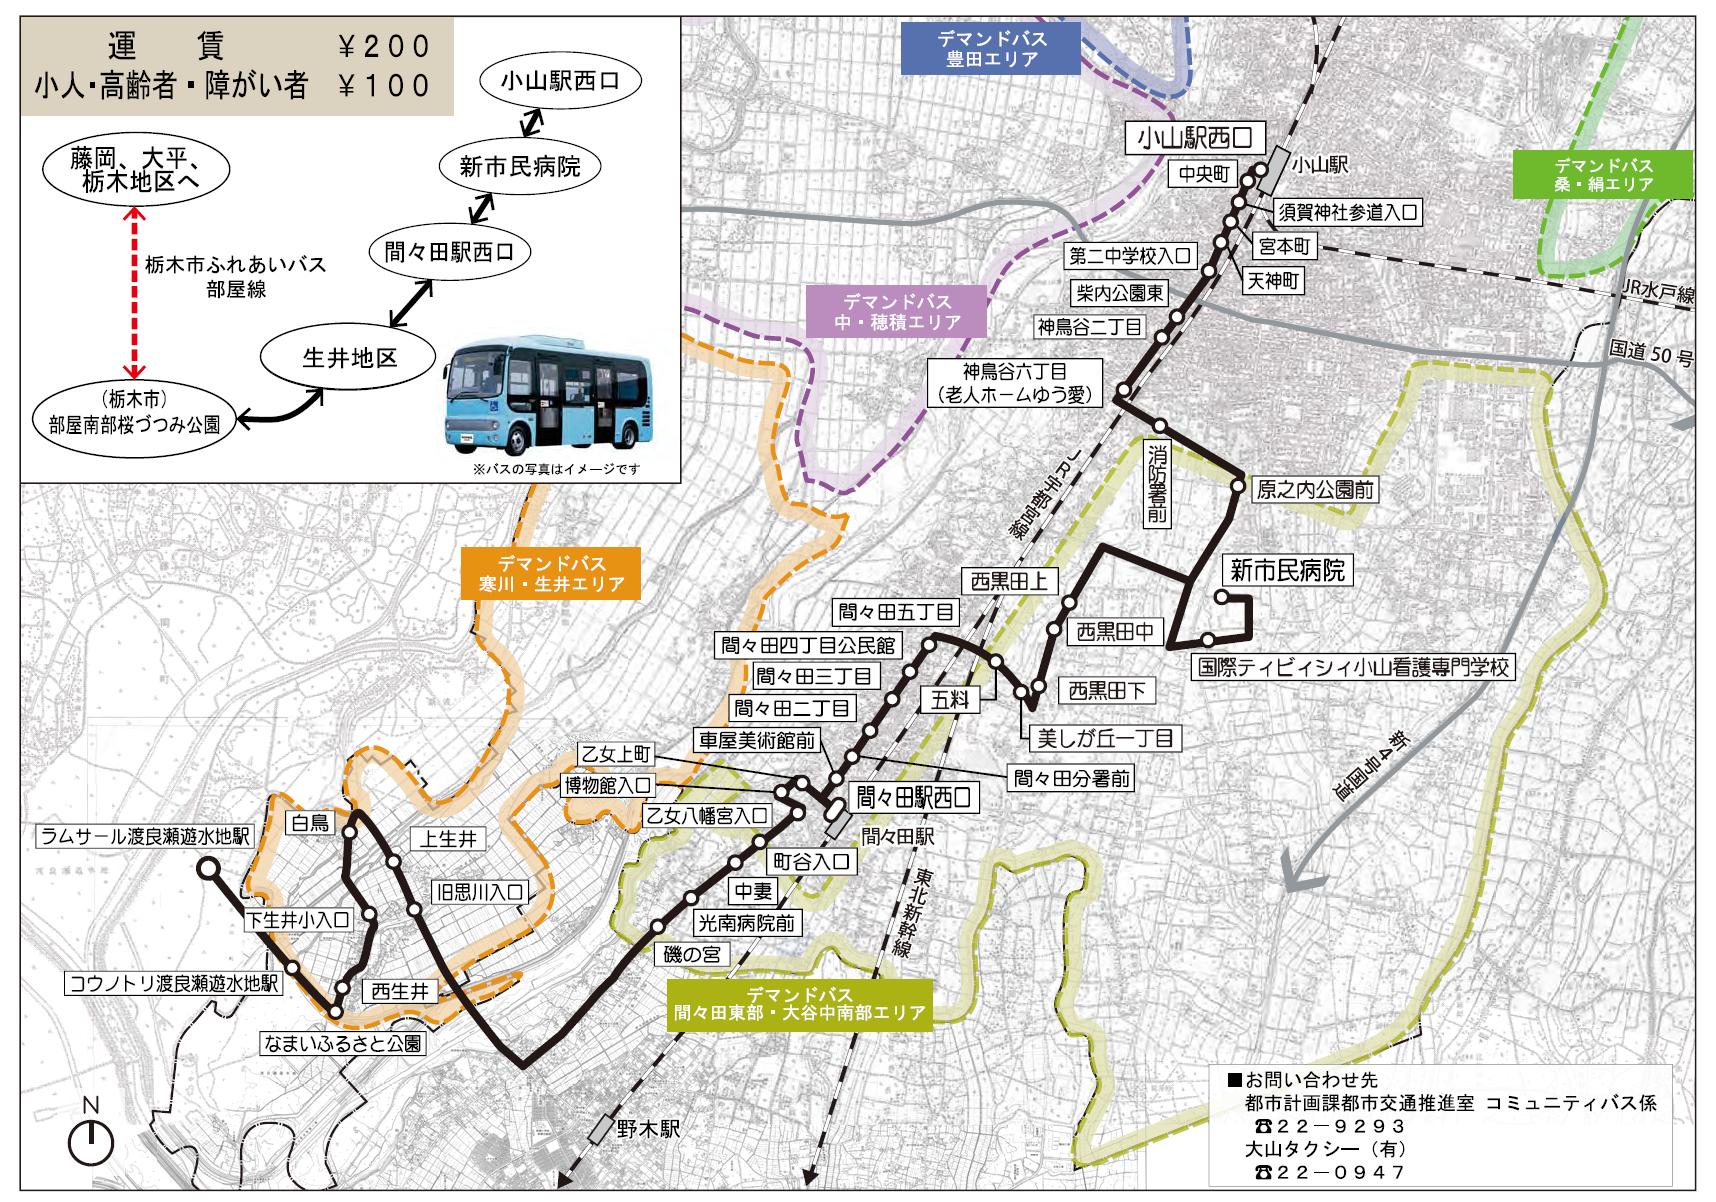 https://www.city.oyama.tochigi.jp/uploaded/image/202346.png